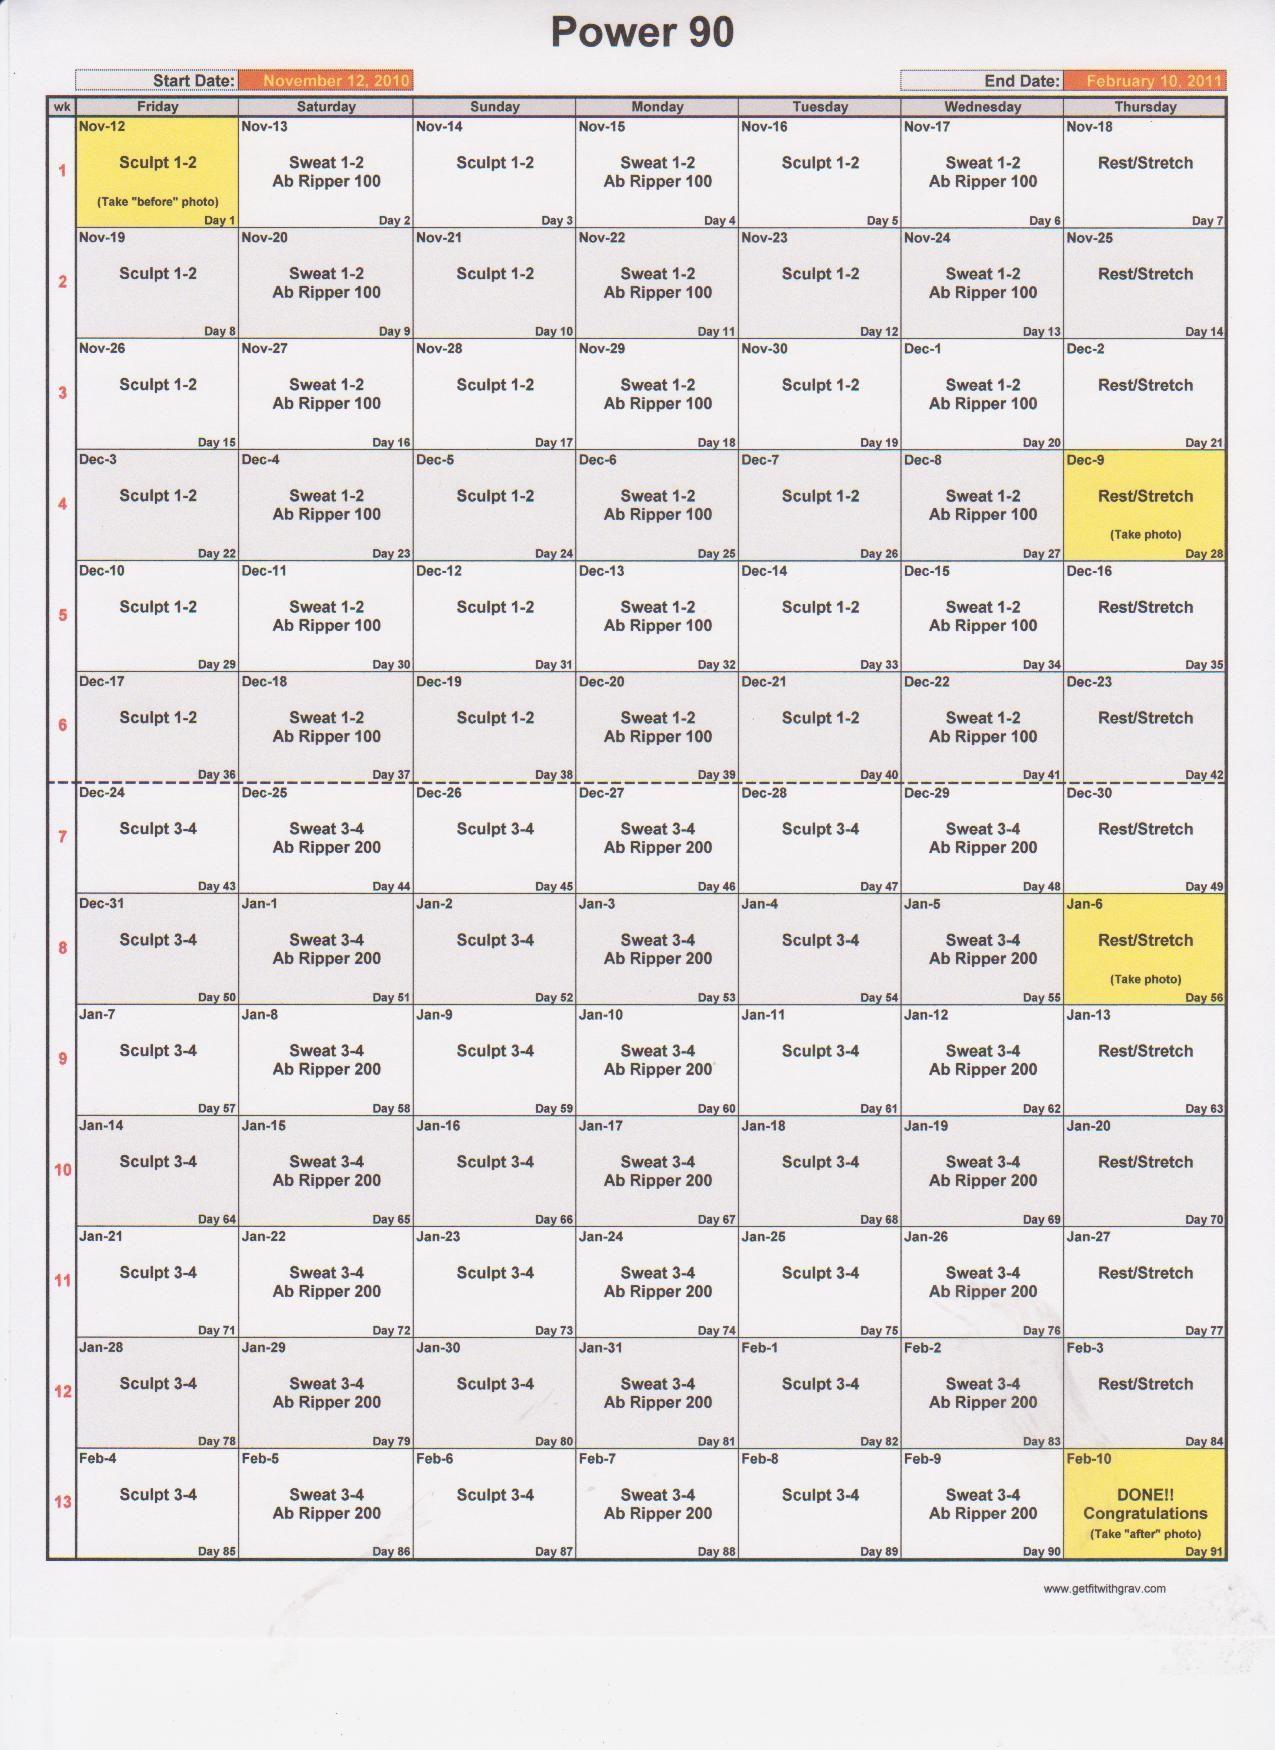 The Original Power 90 Schedule. He Has Many Beachbody Regarding Supreme 90 Day Workout Chart